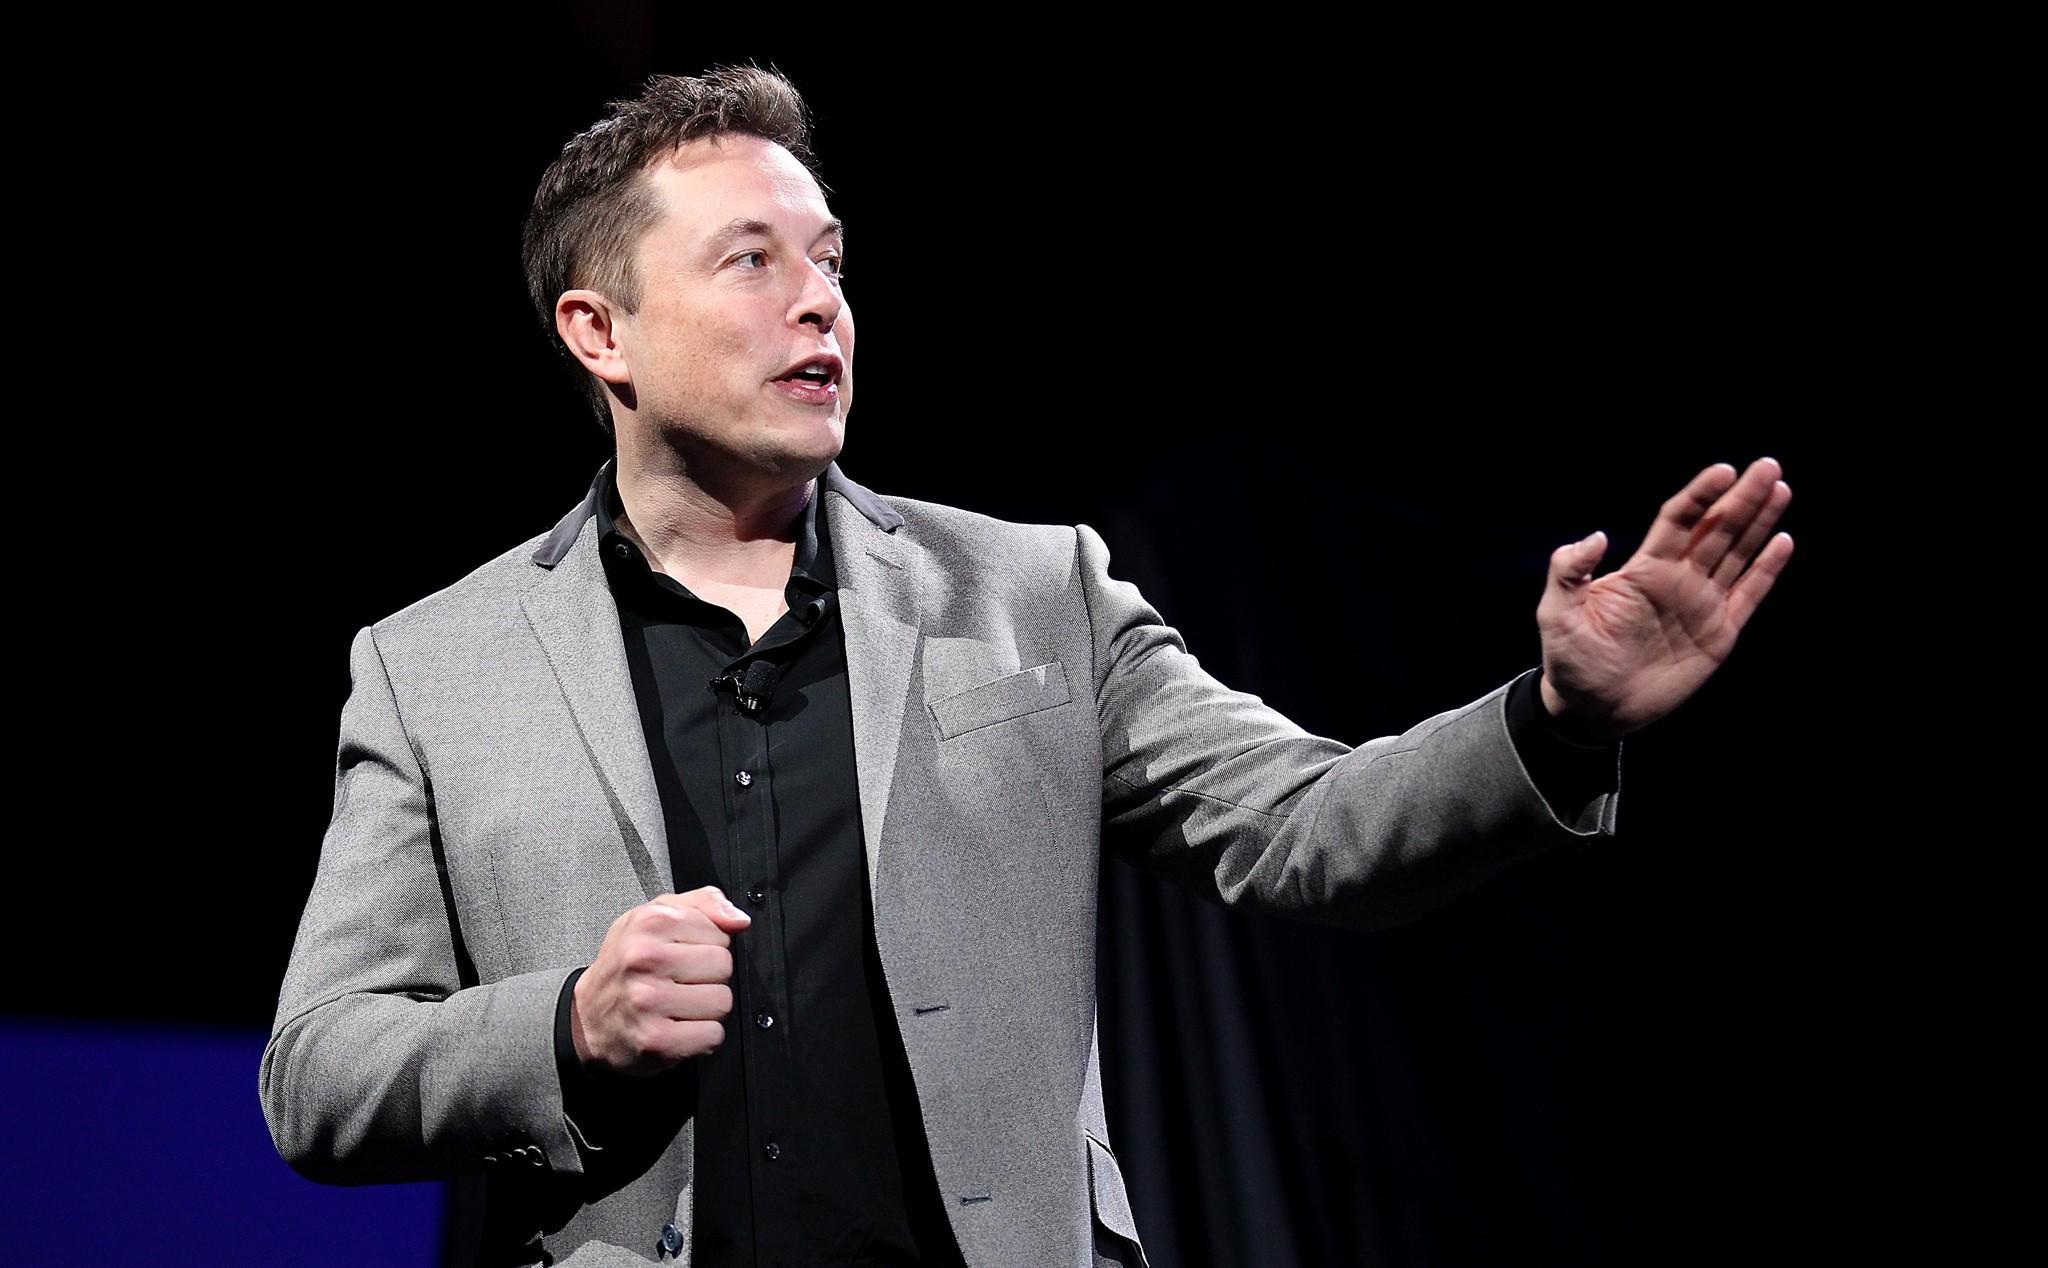 Elon Musk Background